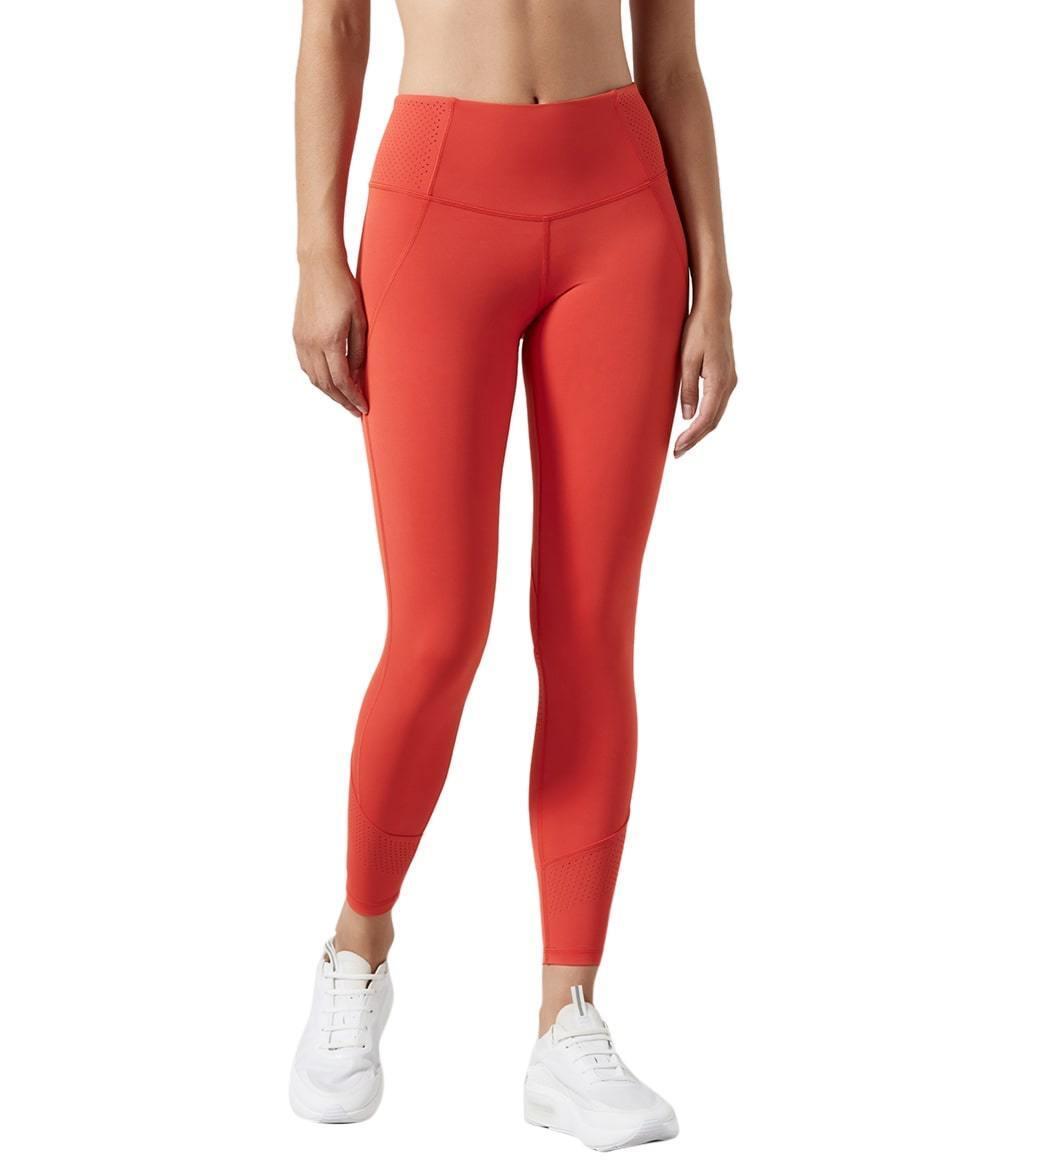 Yoga Outlet Lilybod Arizona Long Yoga Leggings